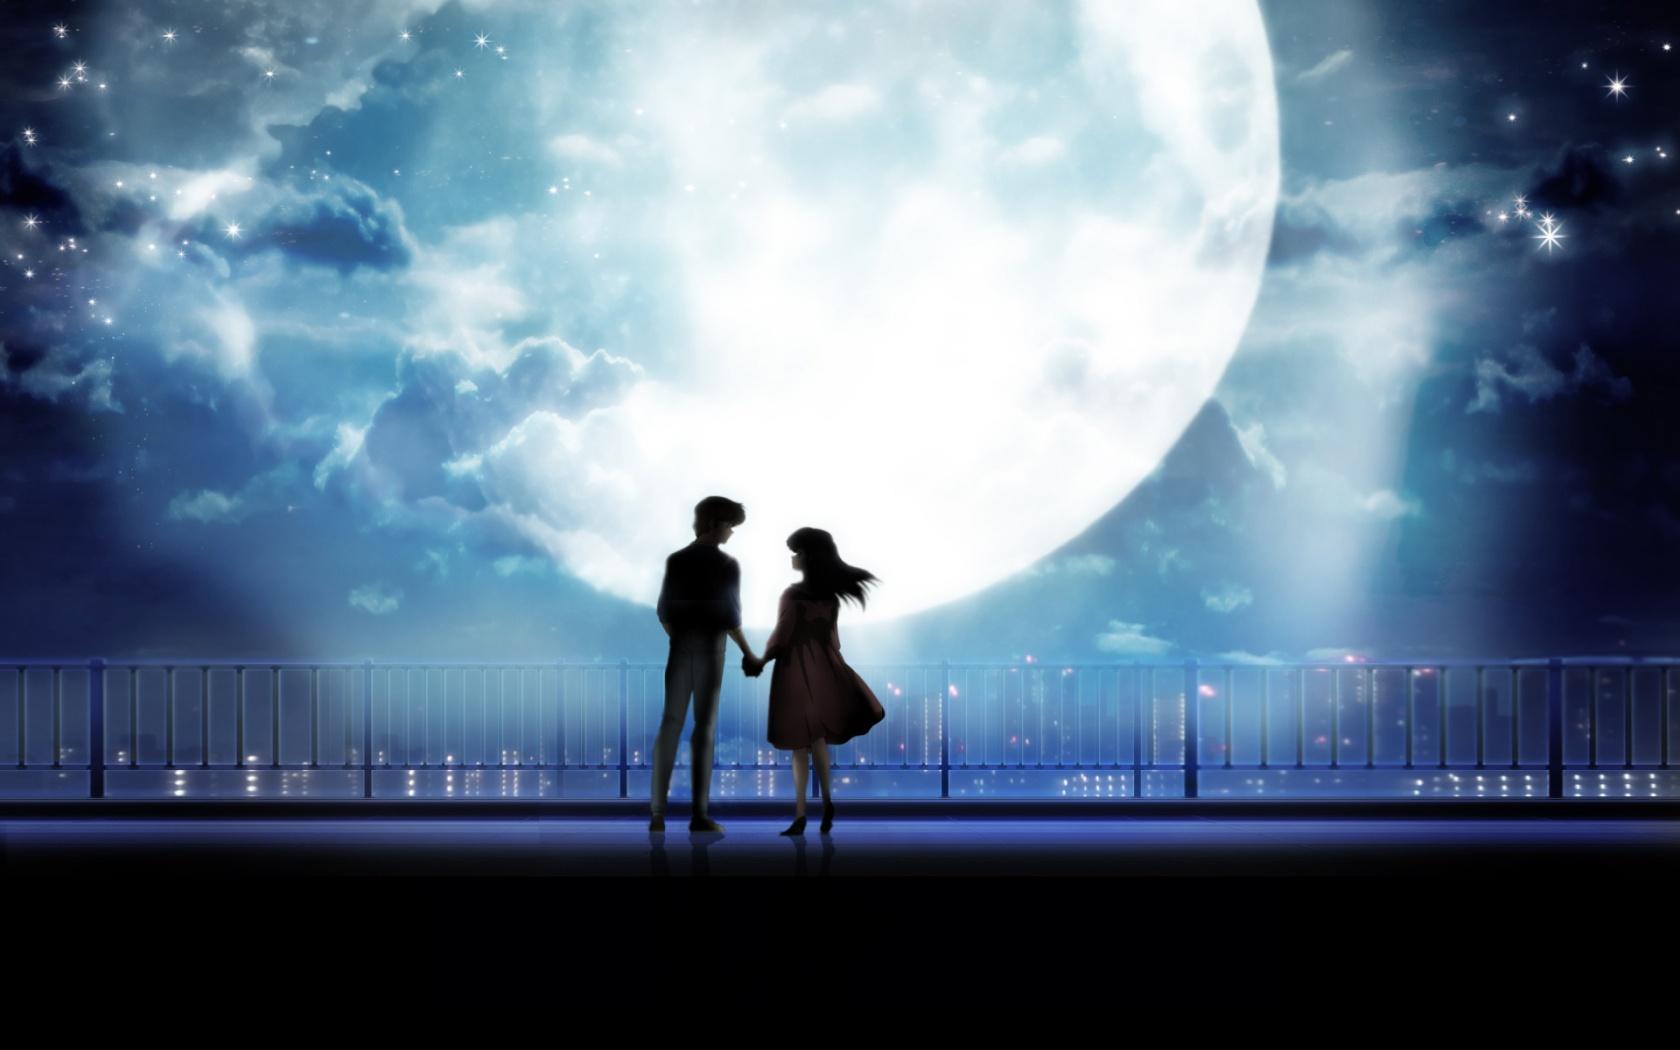 Anime Art Couple Holding Hands Moonlight Desktop